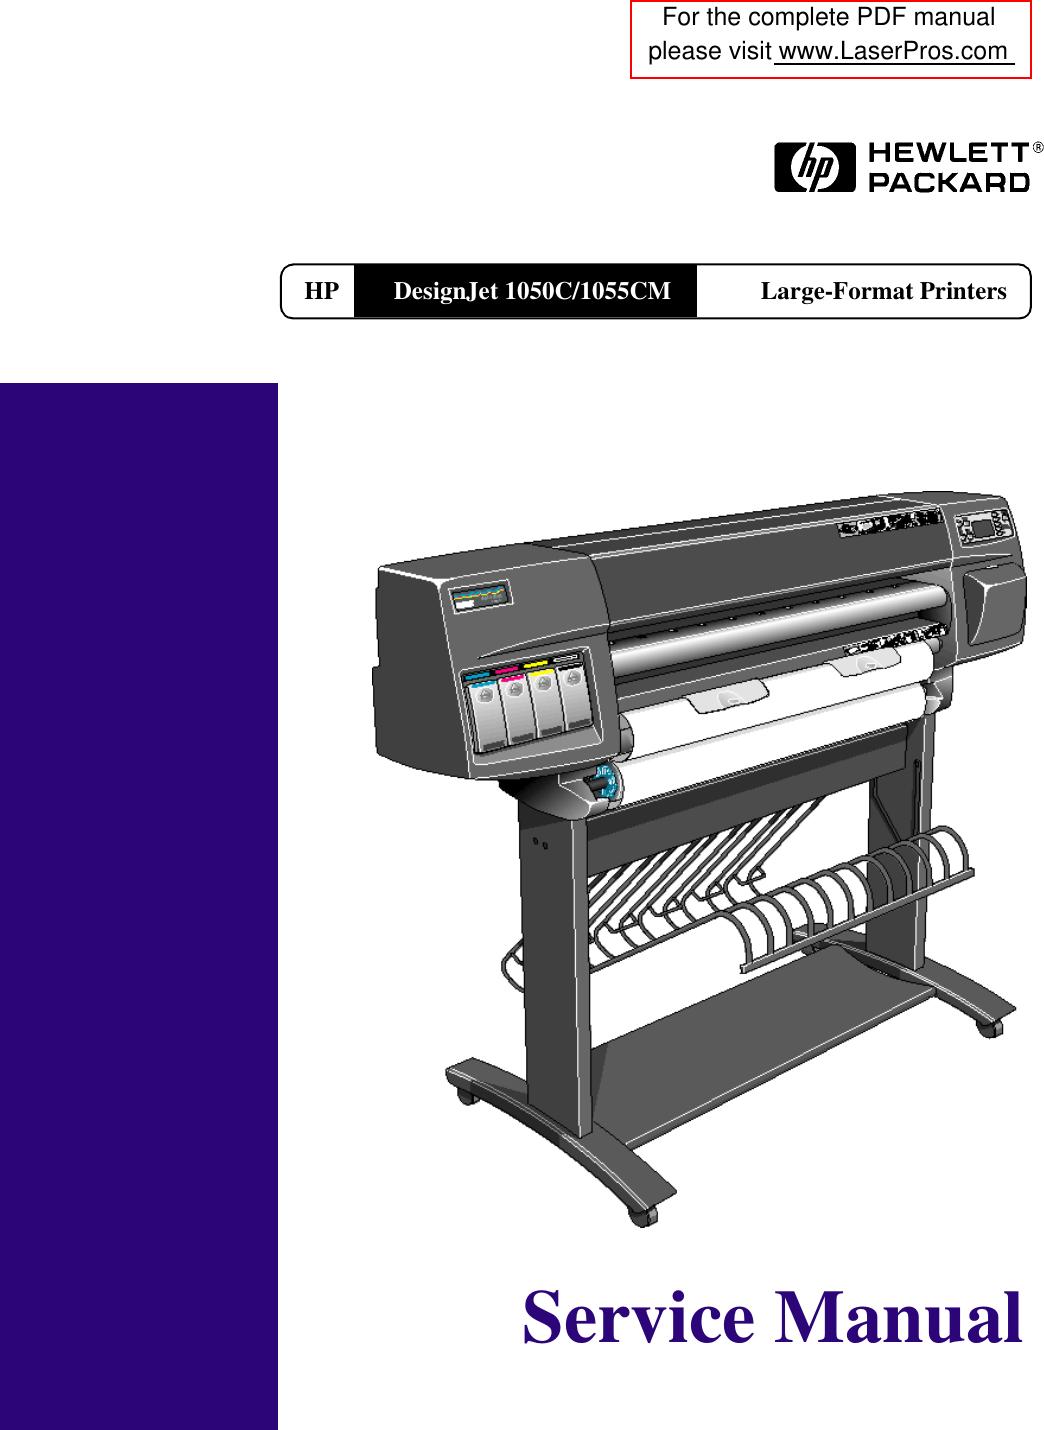 hp designjet large format printer 1050c users manual 1050 series service rh usermanual wiki hp designjet 1055cm user guide hp designjet 1050c guide utilisateur